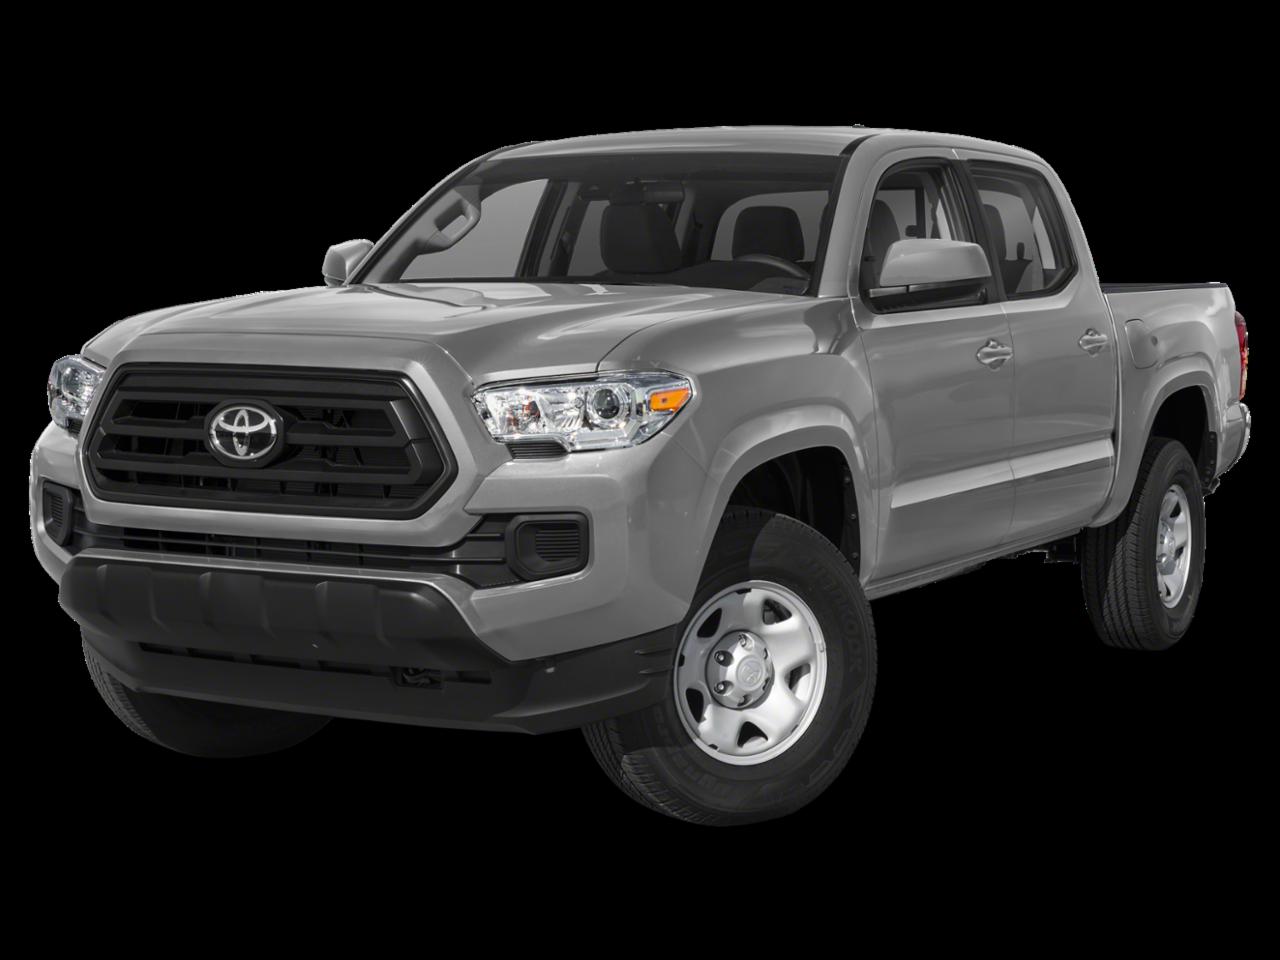 Toyota 2021 Tacoma 4WD Limited